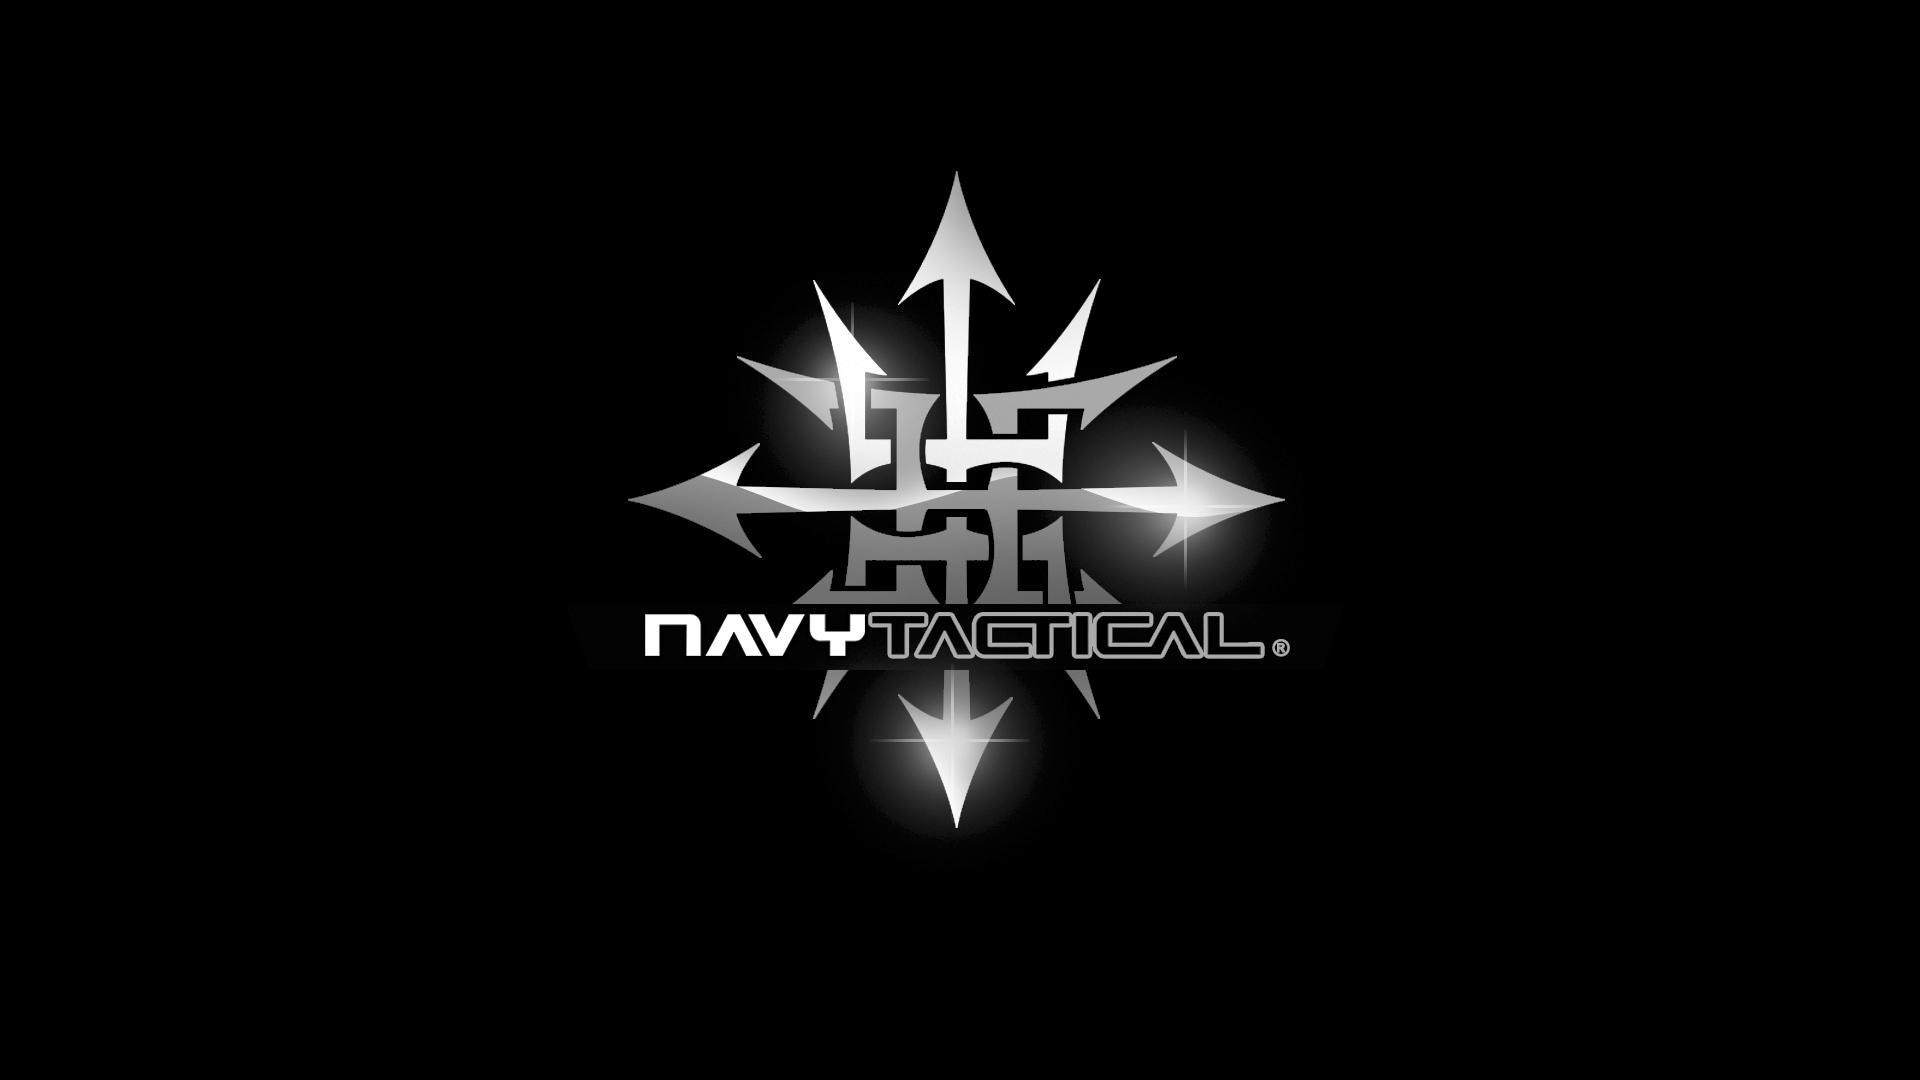 NavyChiefcom Wallpapers 1920x1080